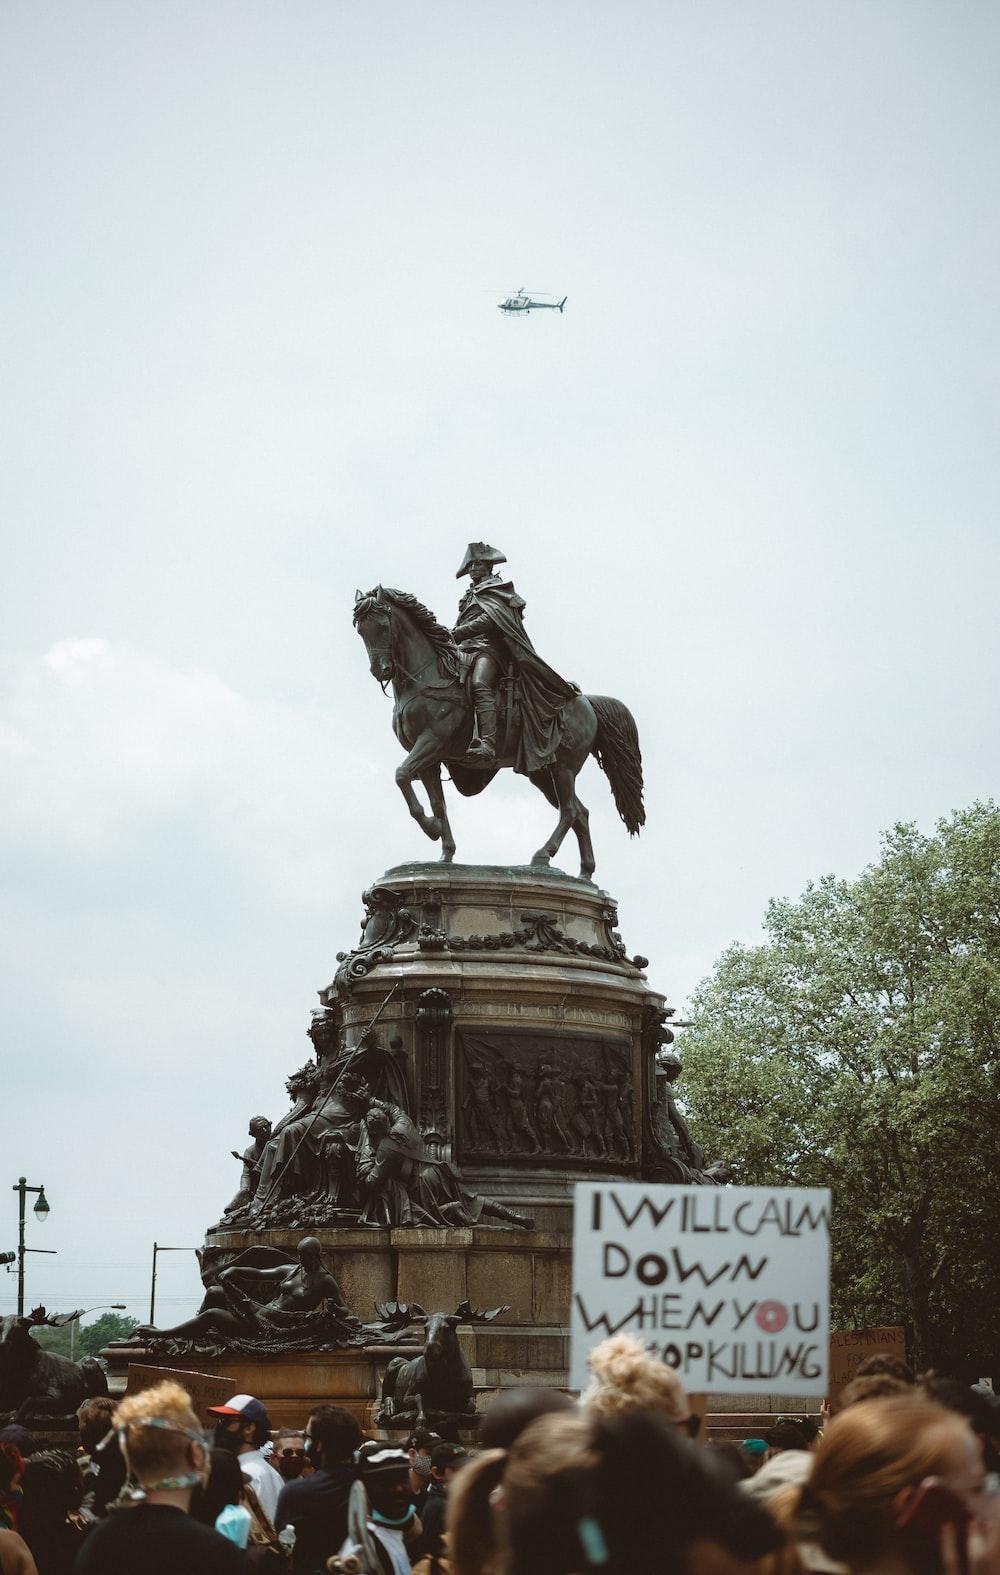 man riding horse statue during daytime